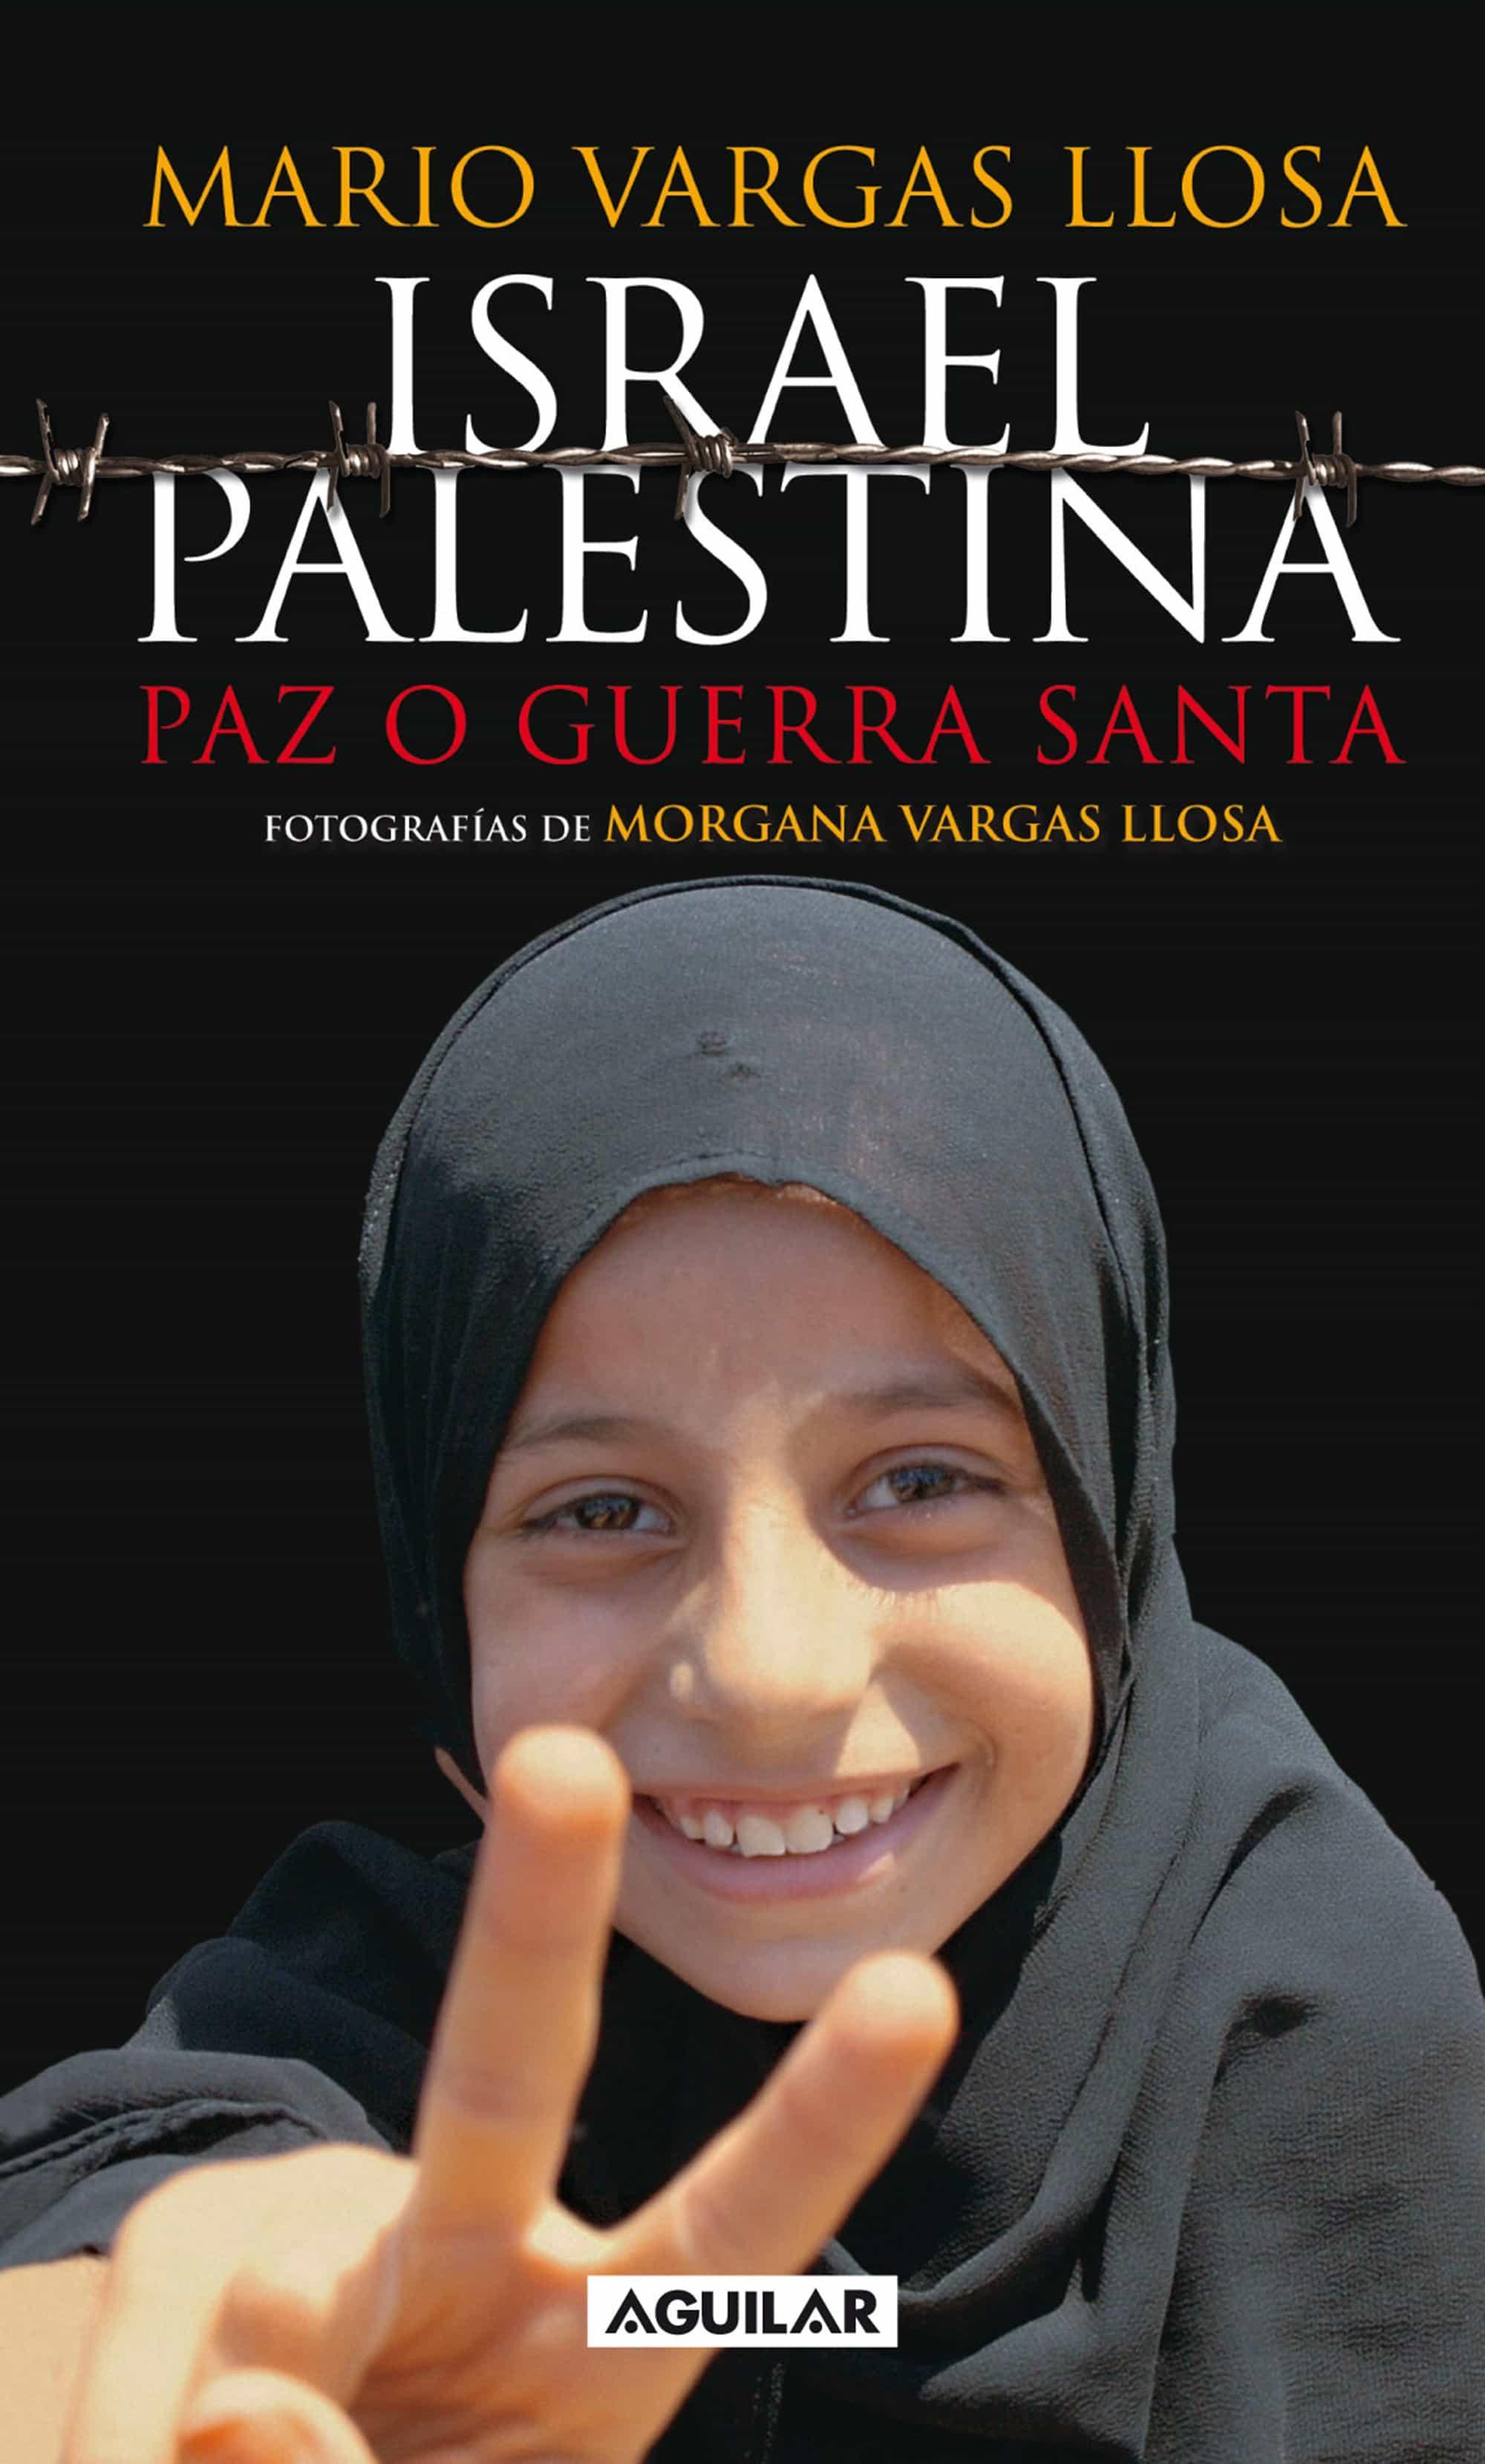 Palestina: Paz O Guerra Santa (ebook)mario Vargas Llosa